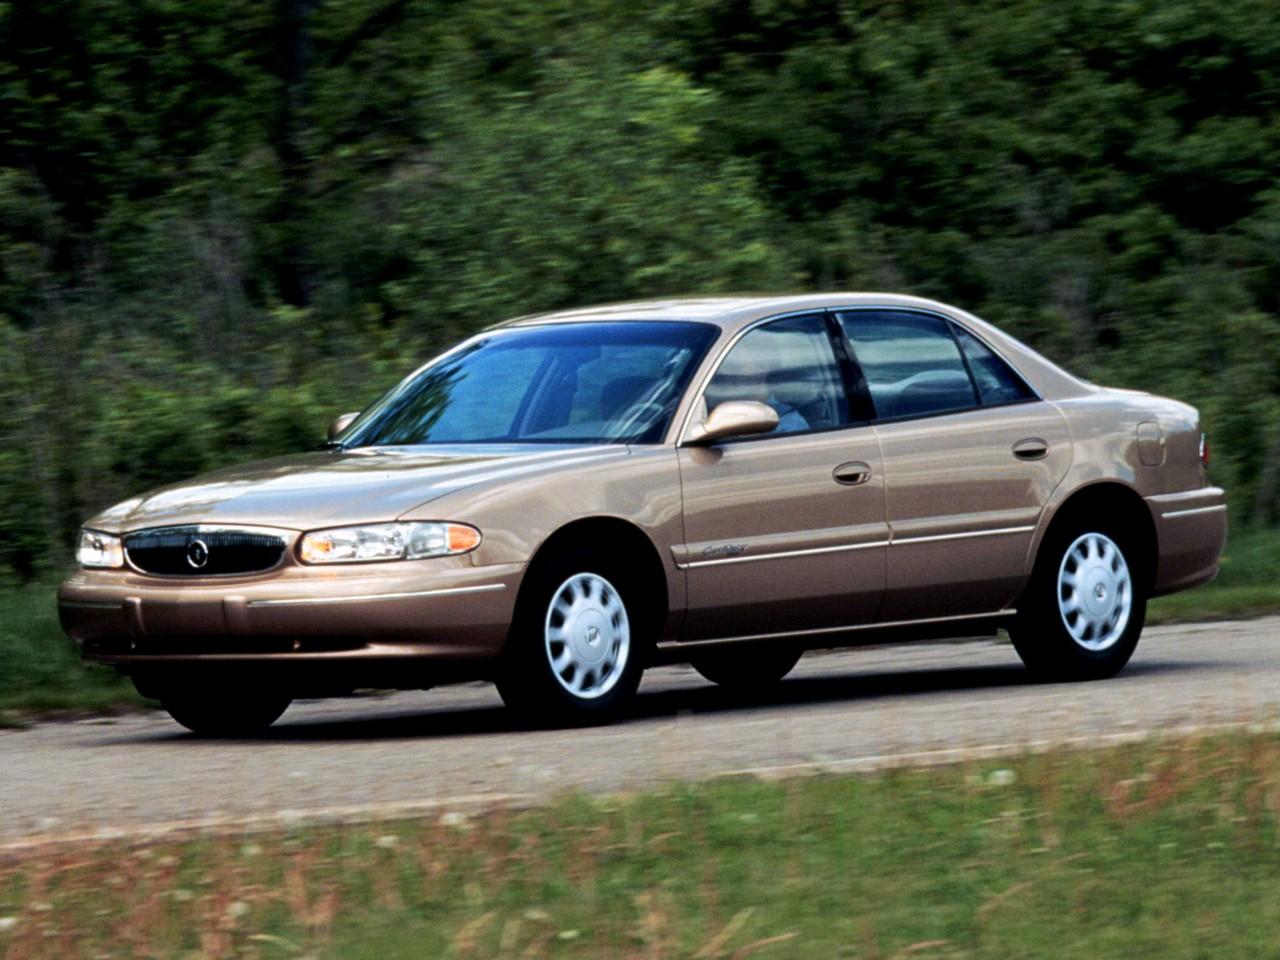 New Buick Grand National >> BUICK Century specs & photos - 1996, 1997, 1998, 1999, 2000, 2001, 2002, 2003, 2004, 2005 ...